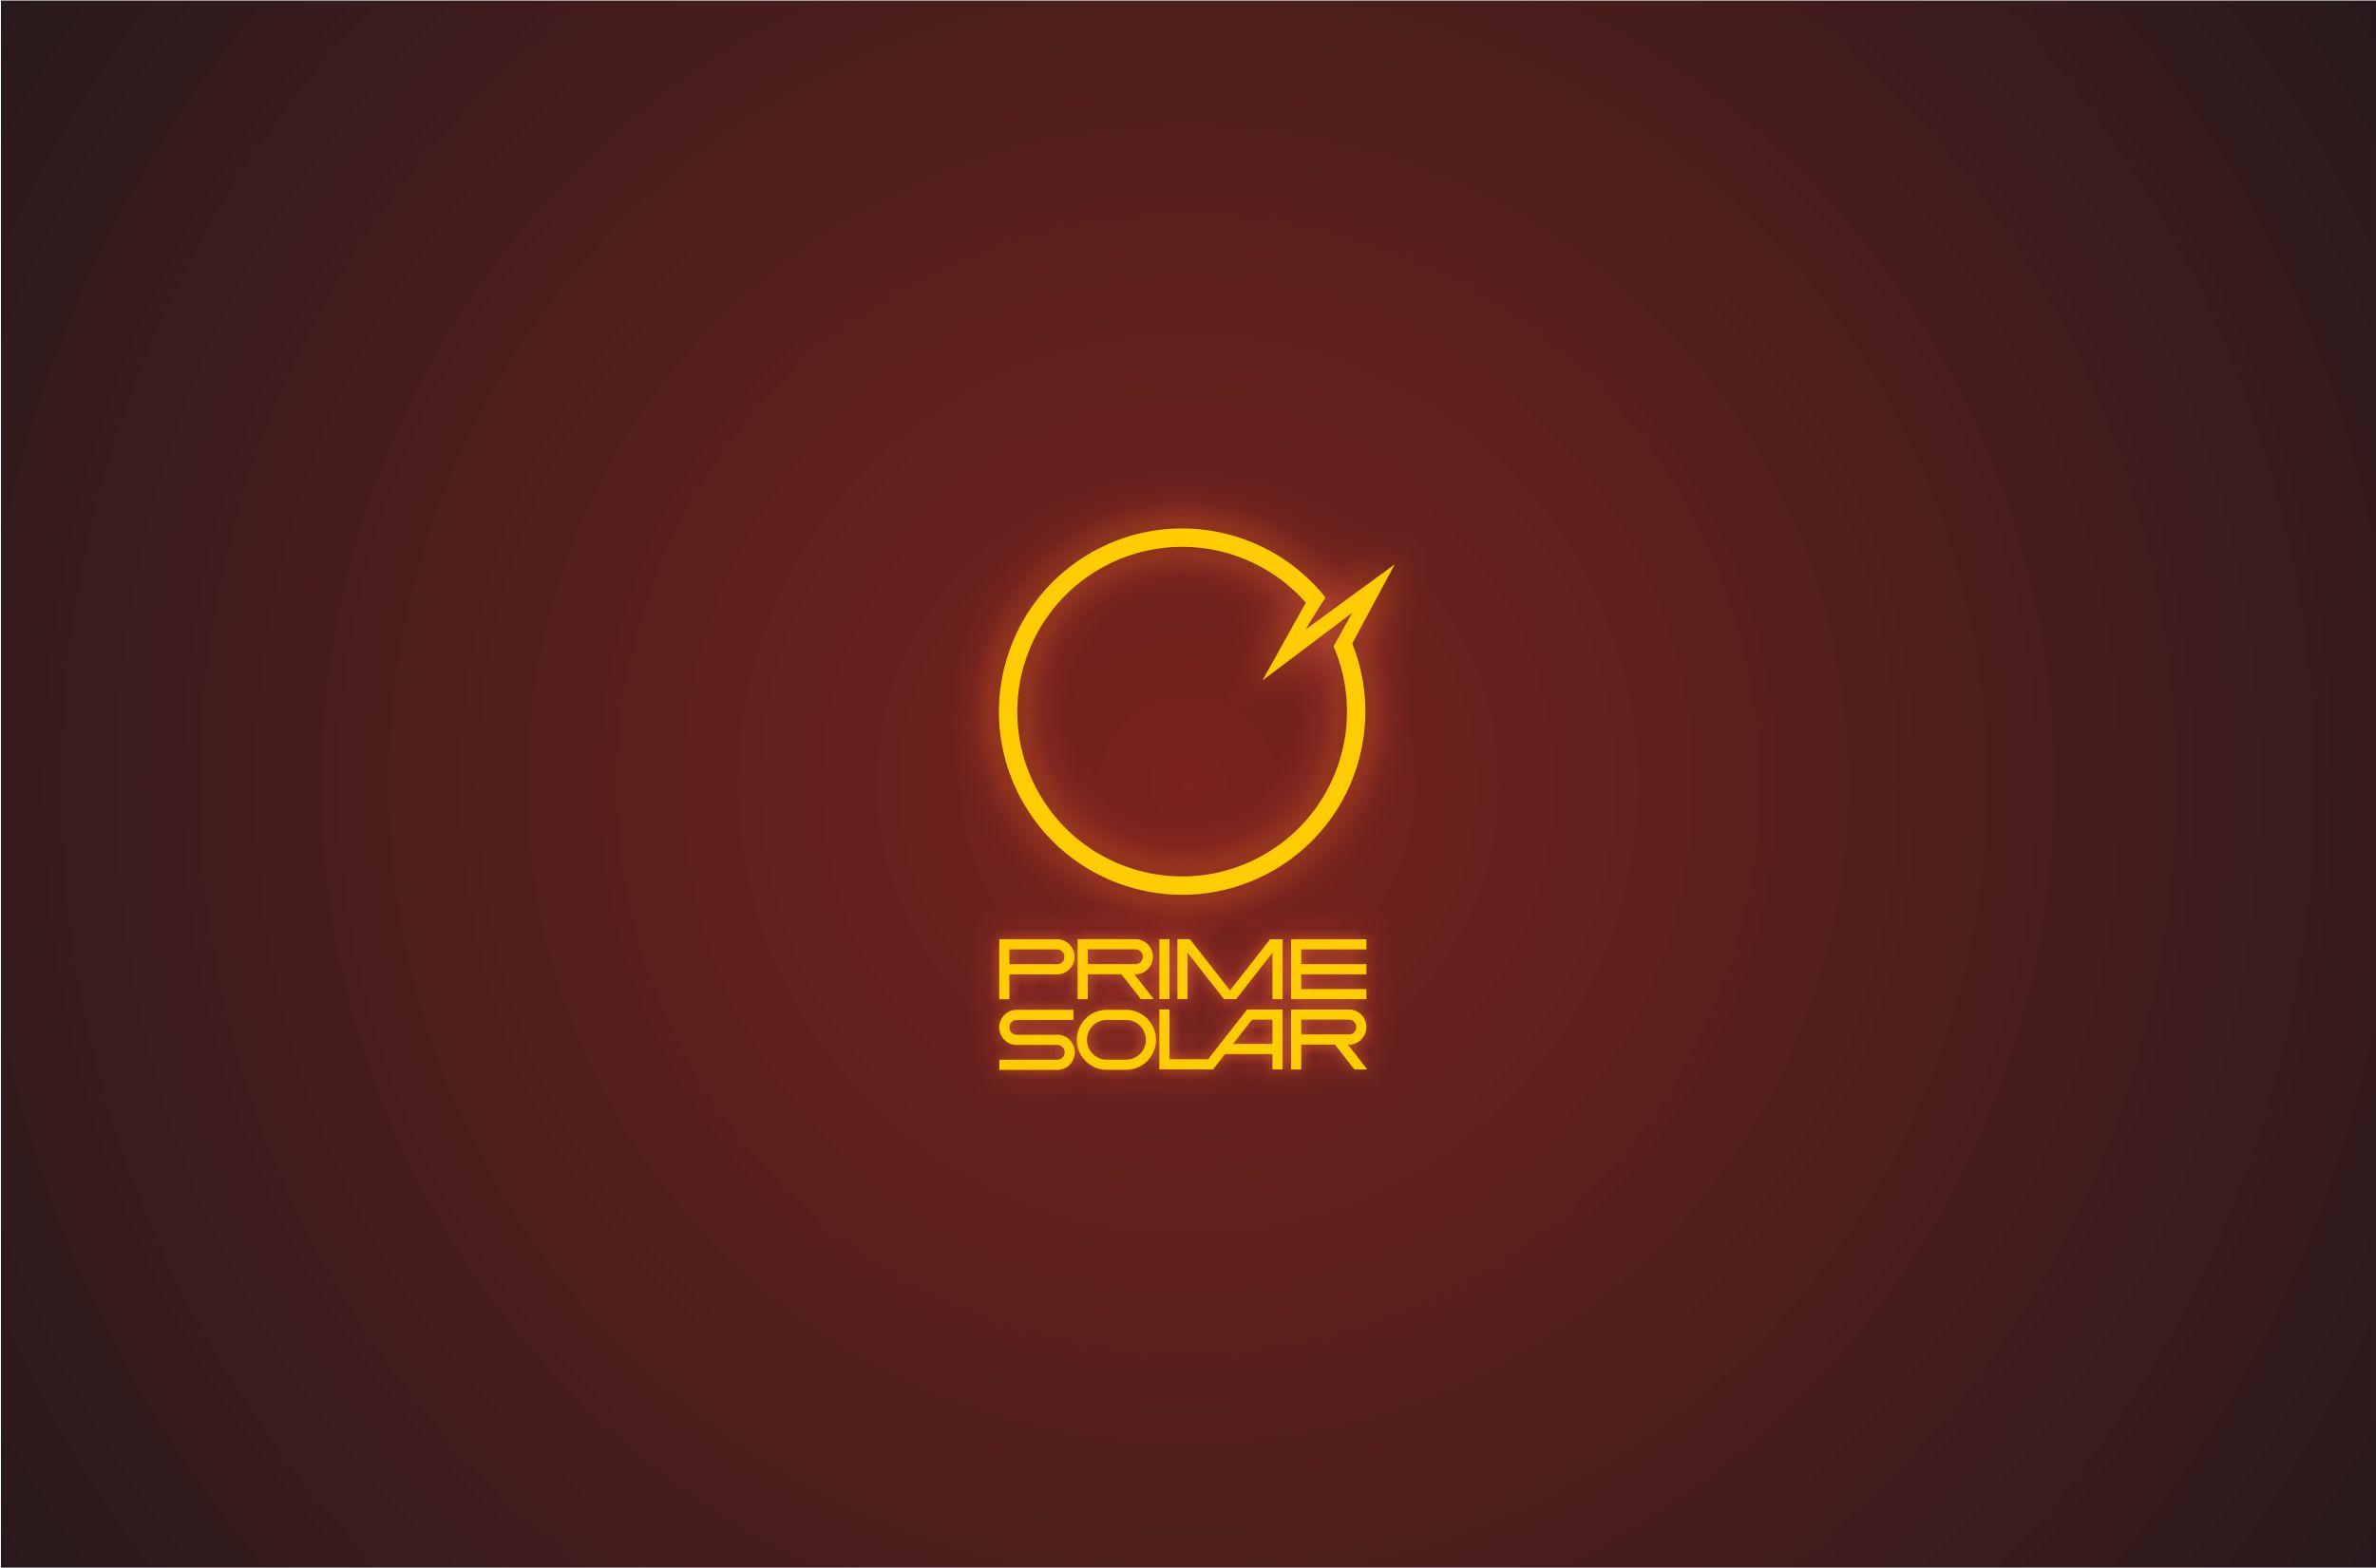 Логотип компании PrimeSolar [UPD: 16:45 15/12/11] фото f_4eea5cd963ecf.jpg